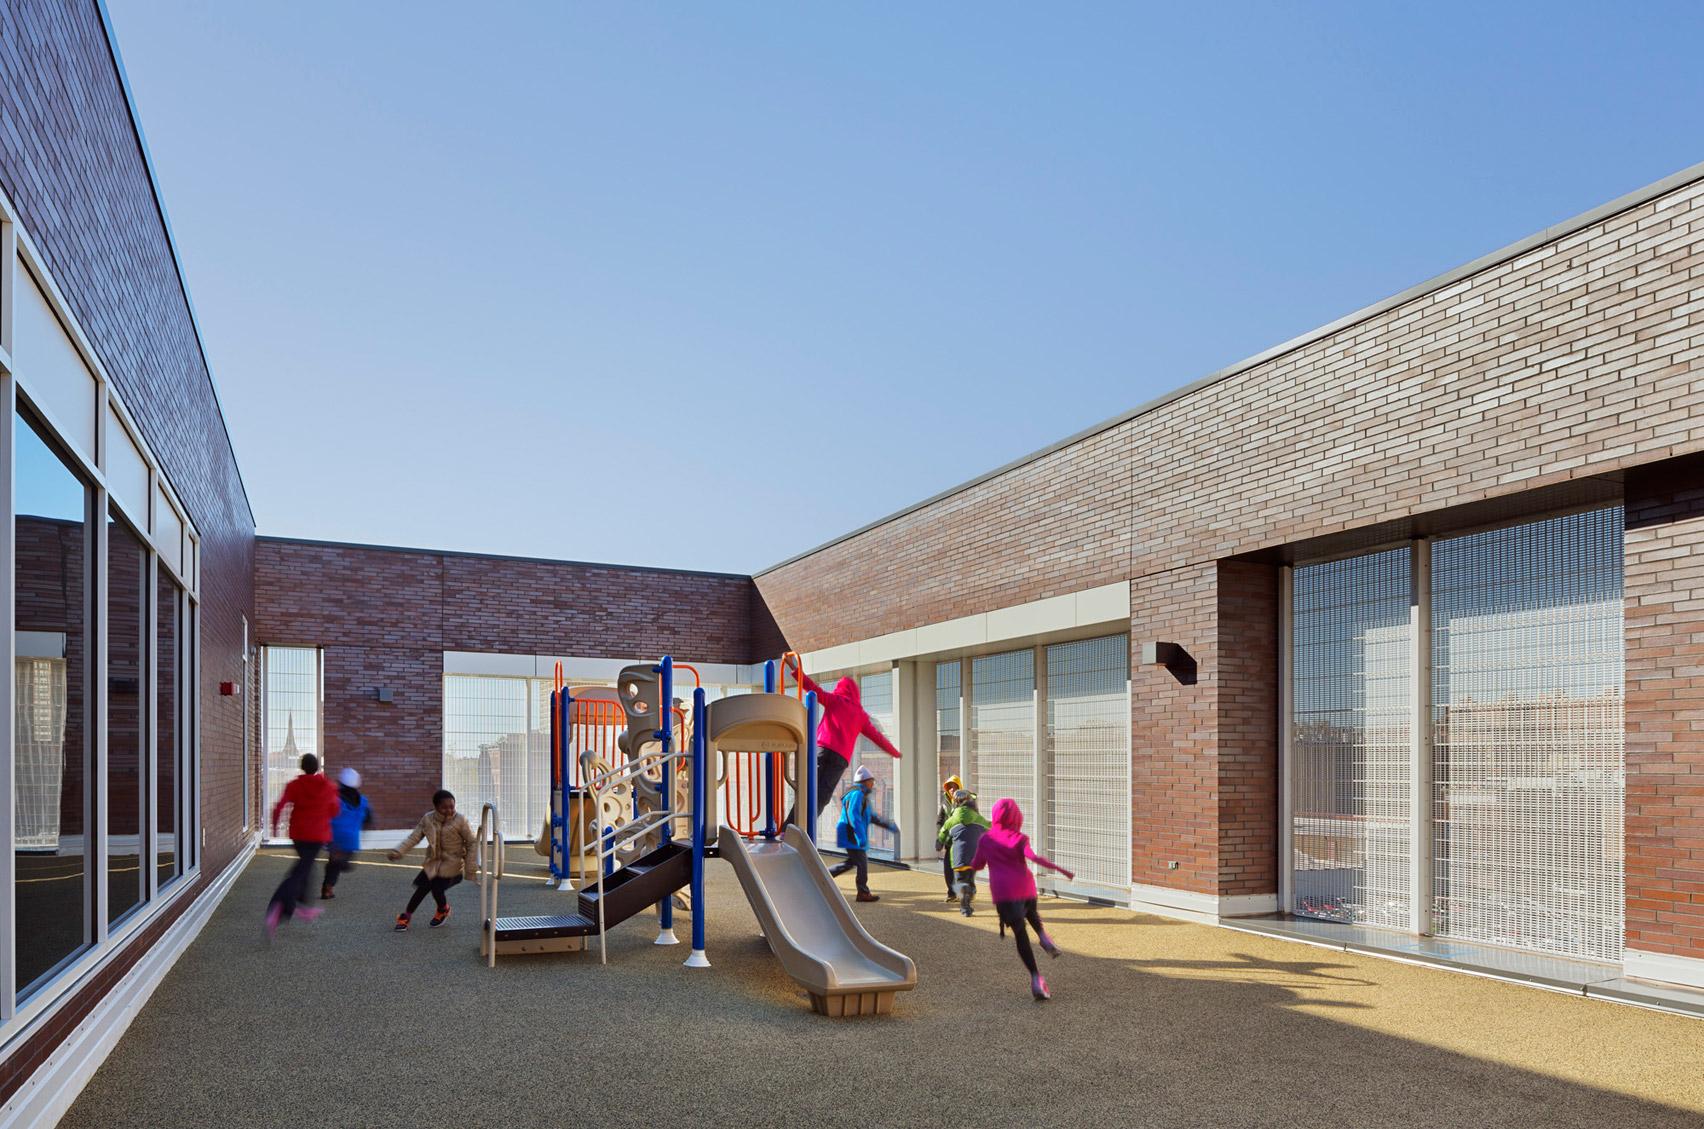 Teacher's Village by Richard Meier and partners